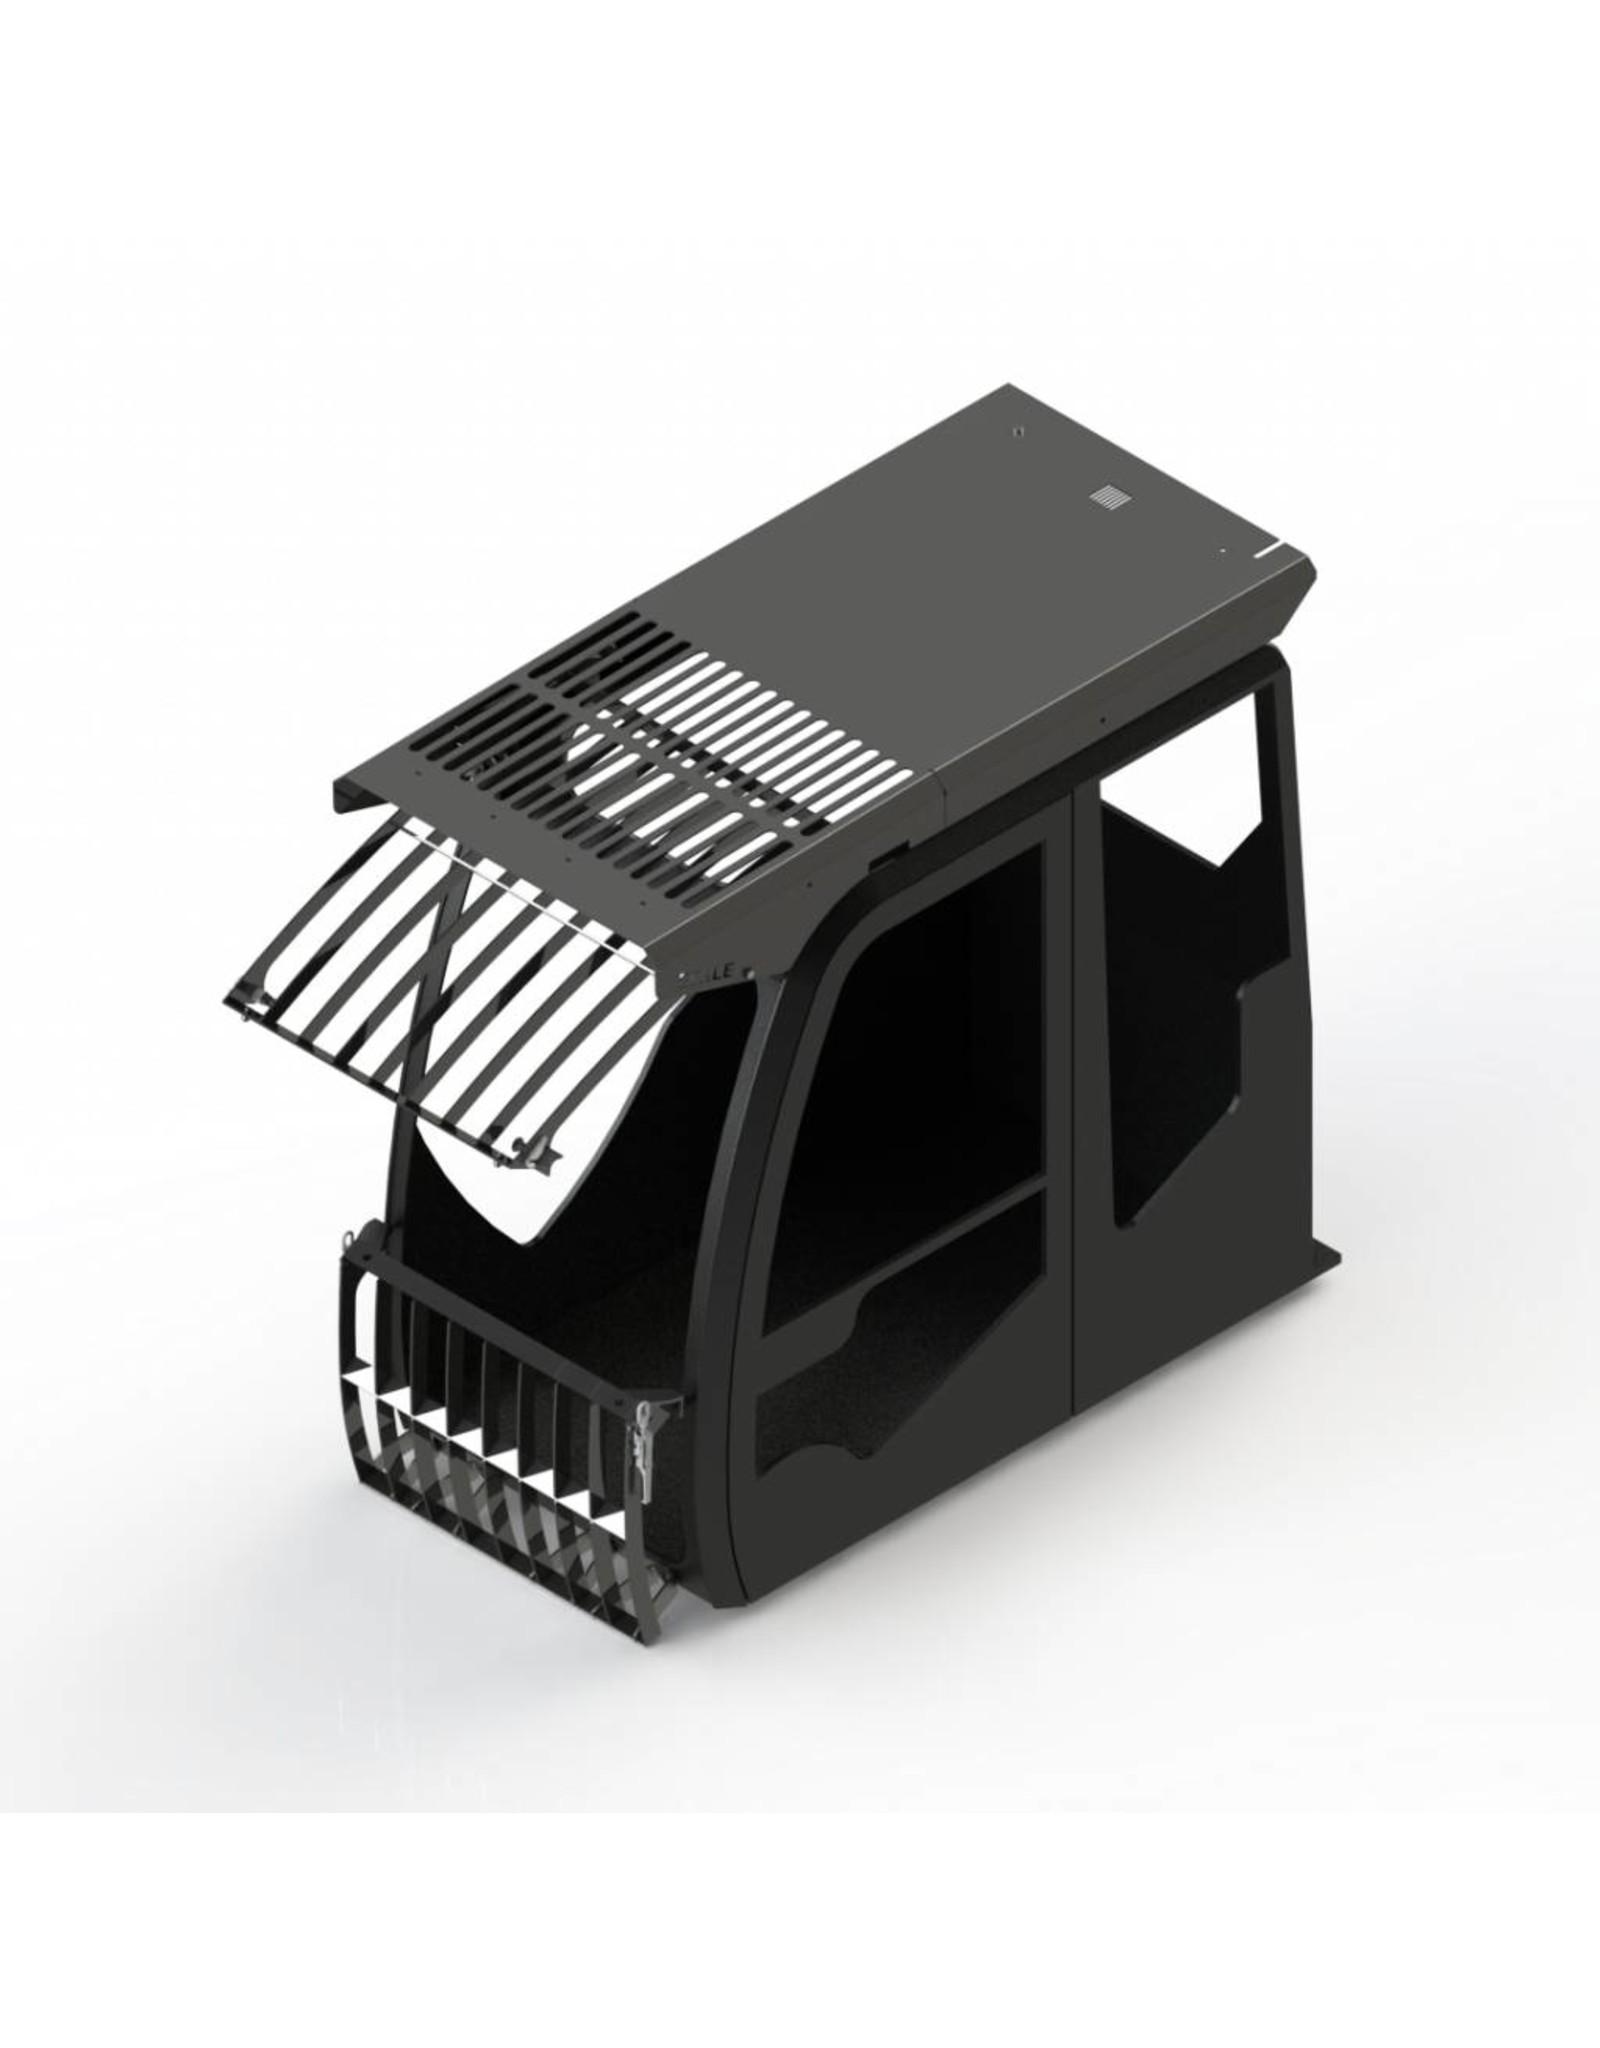 Echle Hartstahl GmbH FOPS for Liebherr R 976